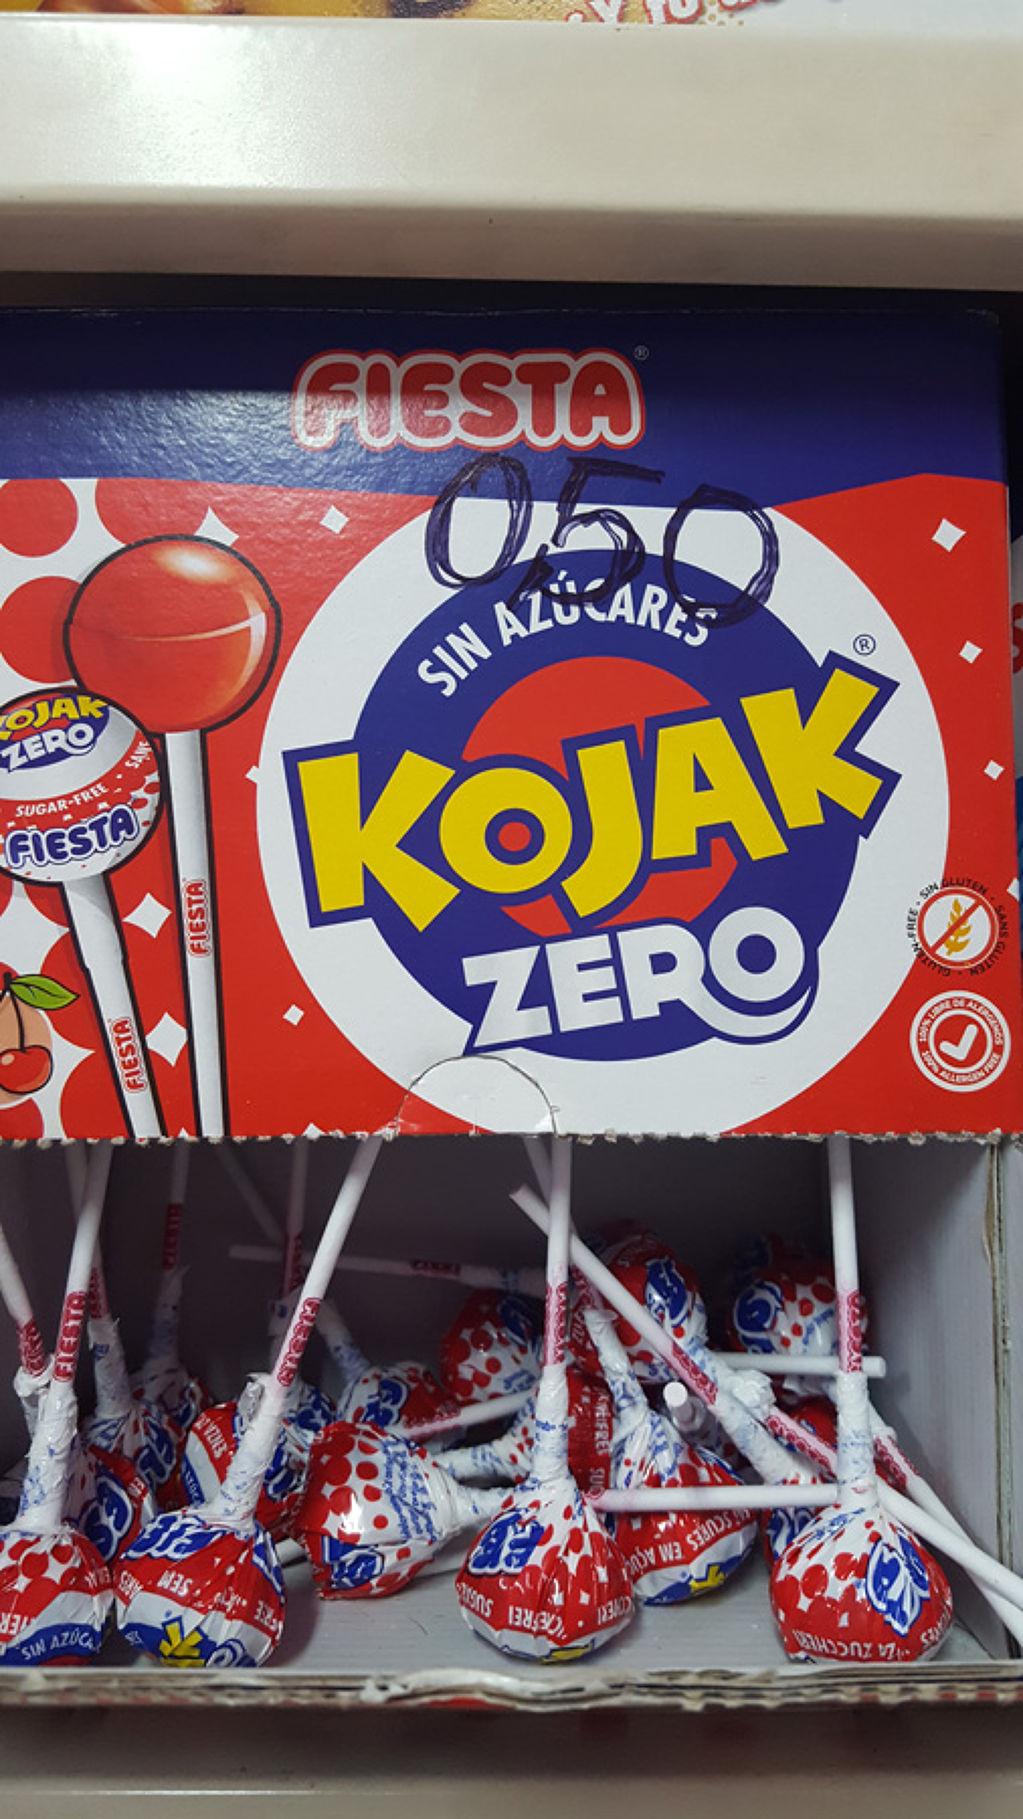 Kojak Zero - d81fd-20200509_082626.jpg